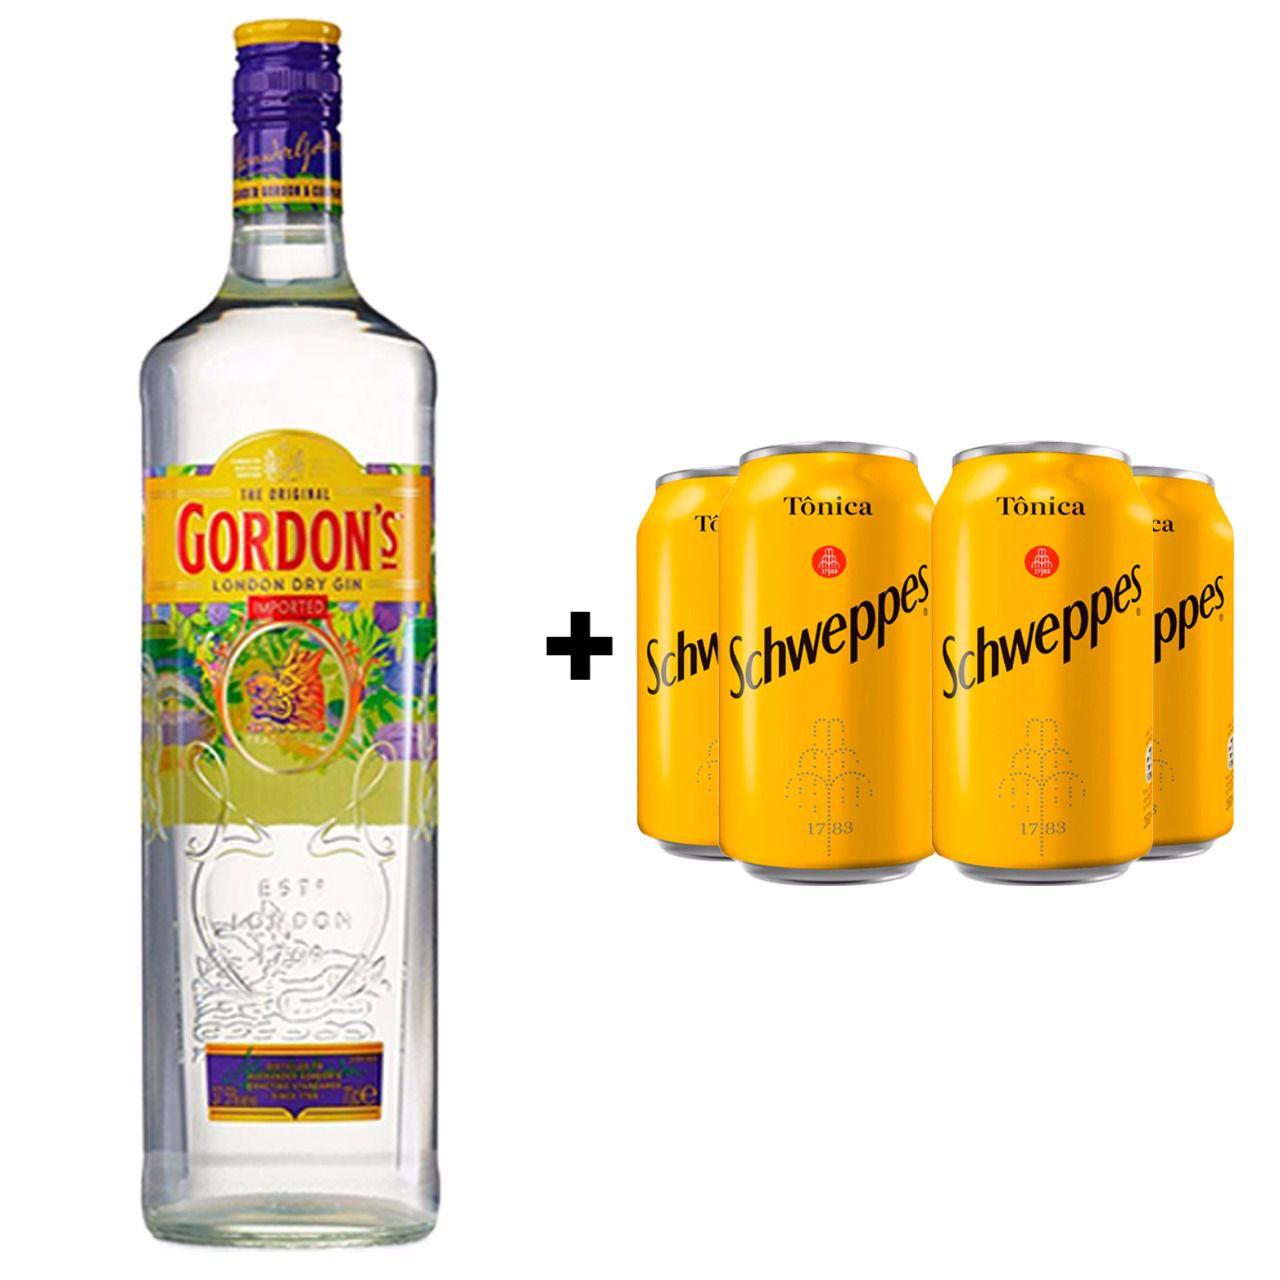 Kit Gin Gordon 750ml + 4 Tônica Schweppes 350ml  - Deliciando Quitanda